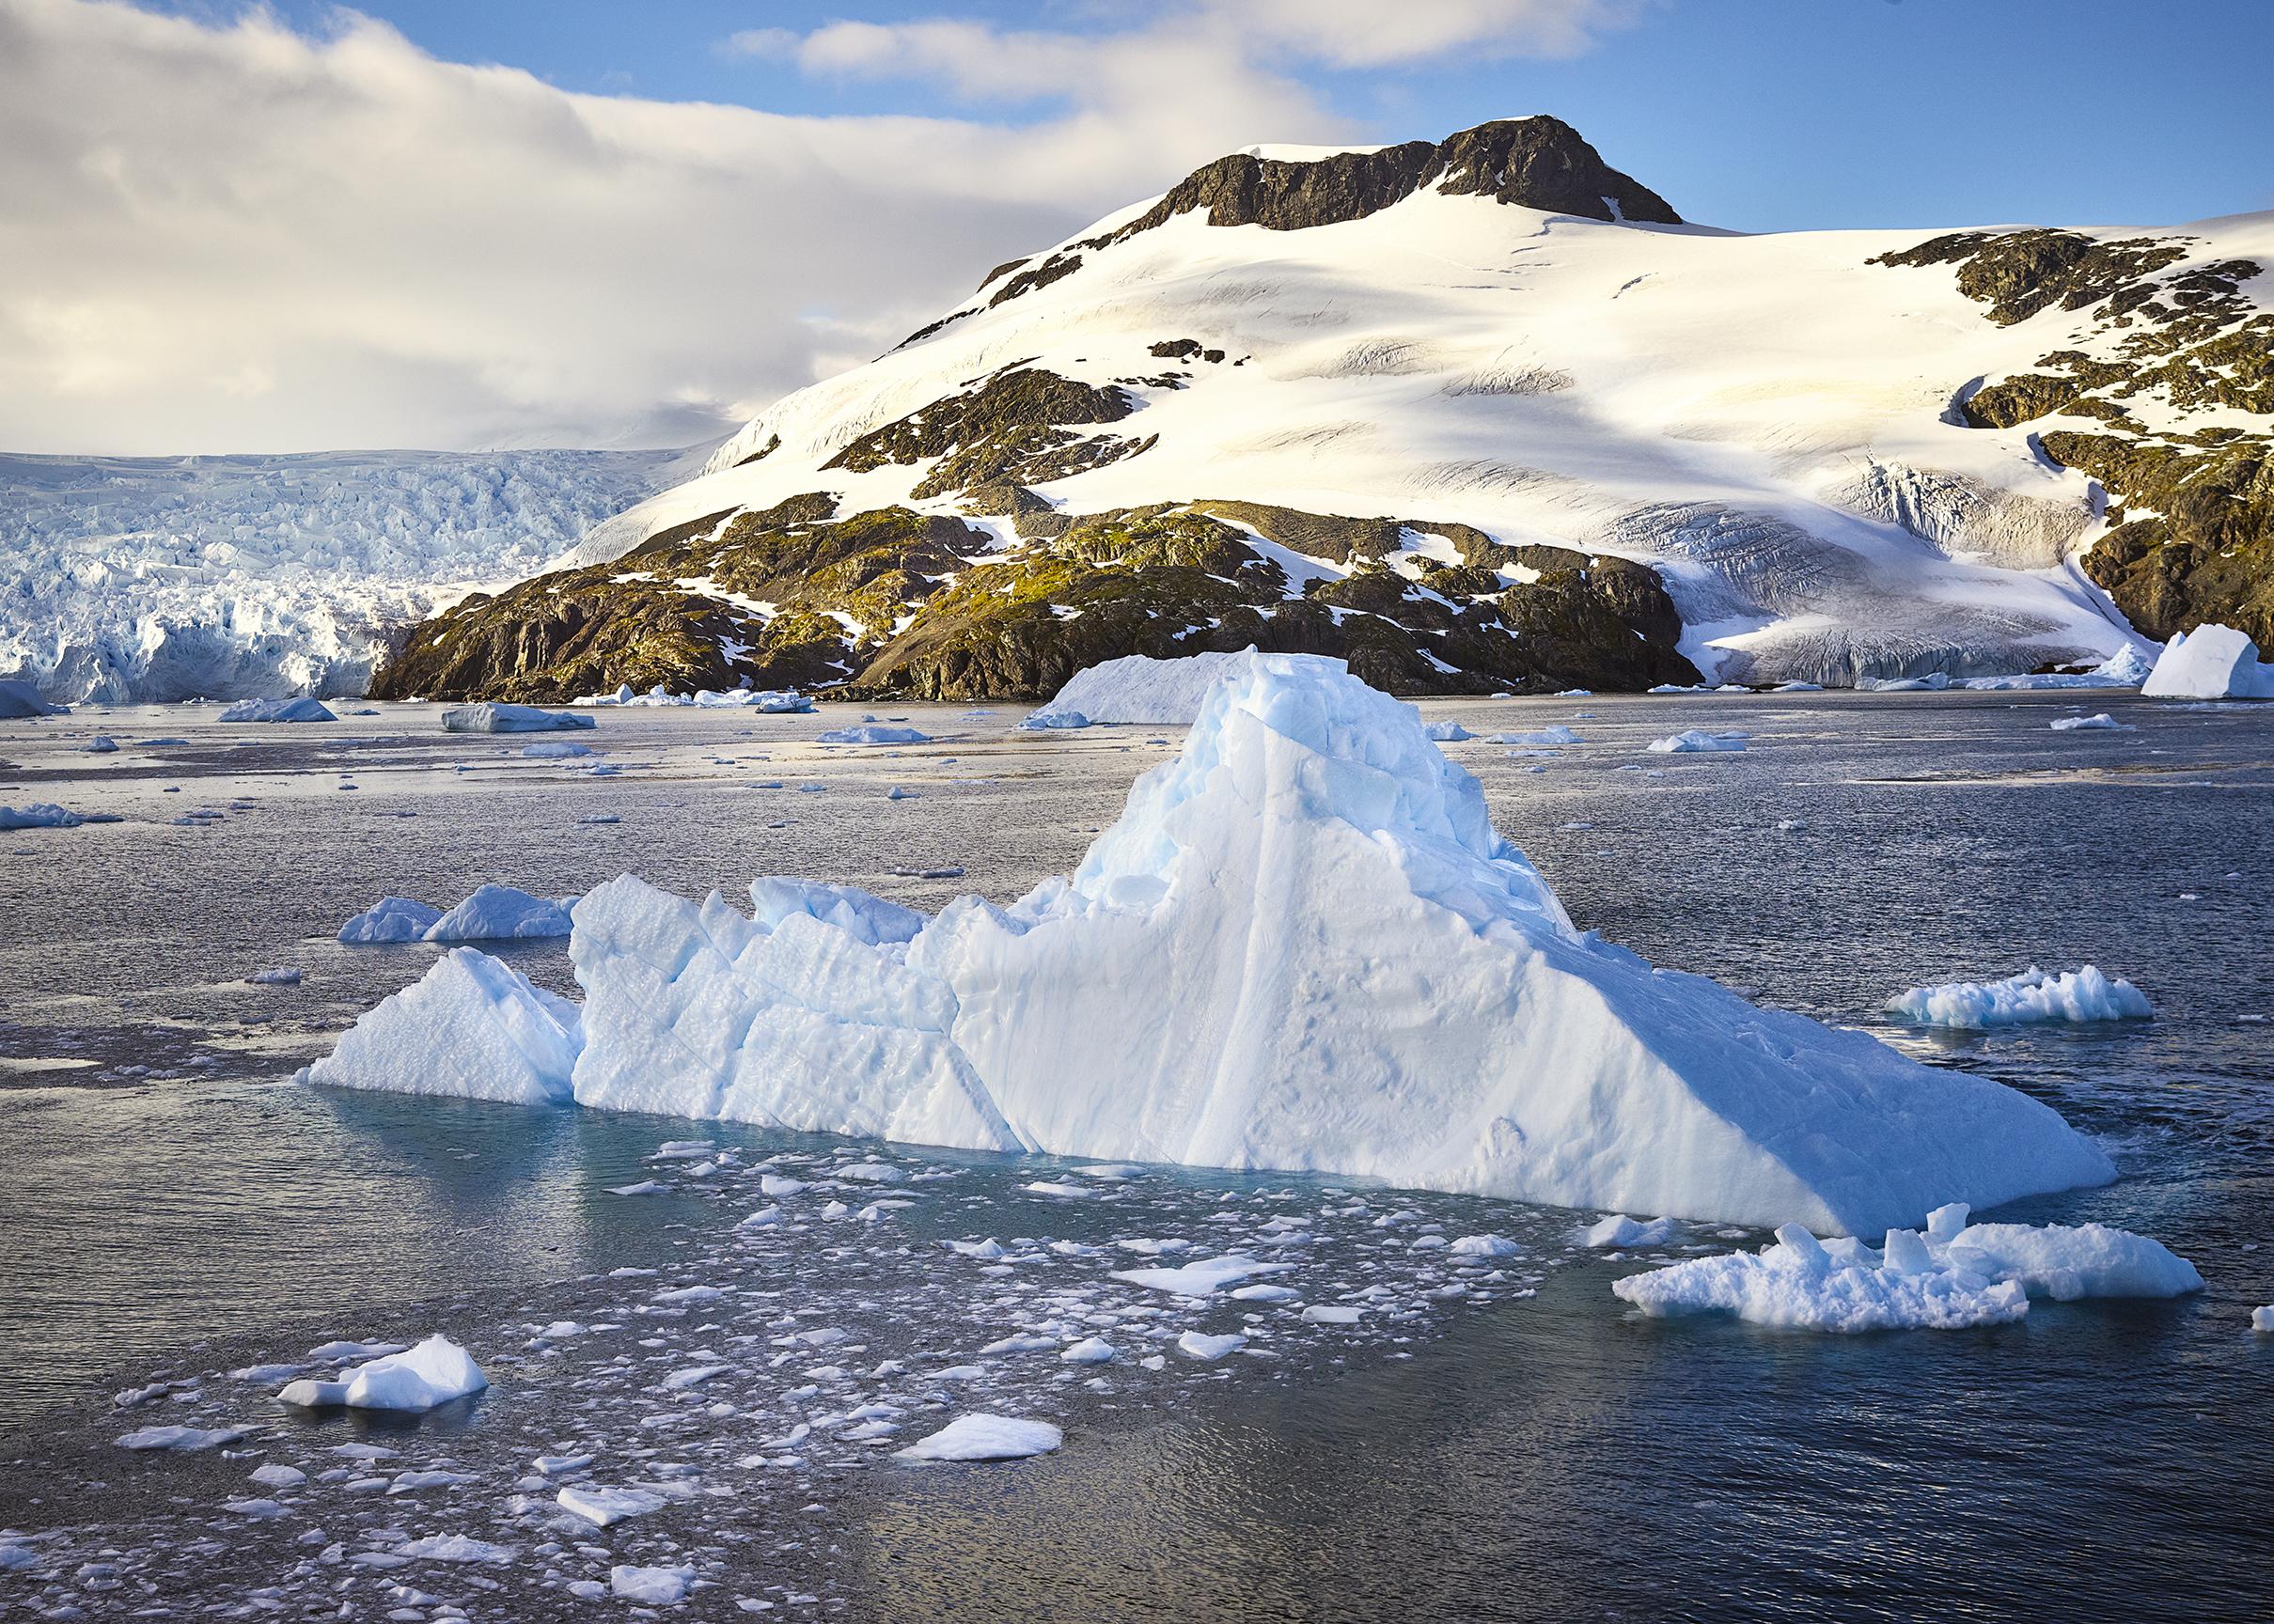 JPG (8-bit)-15_0202-Antarctica 2-CF000651.jpg